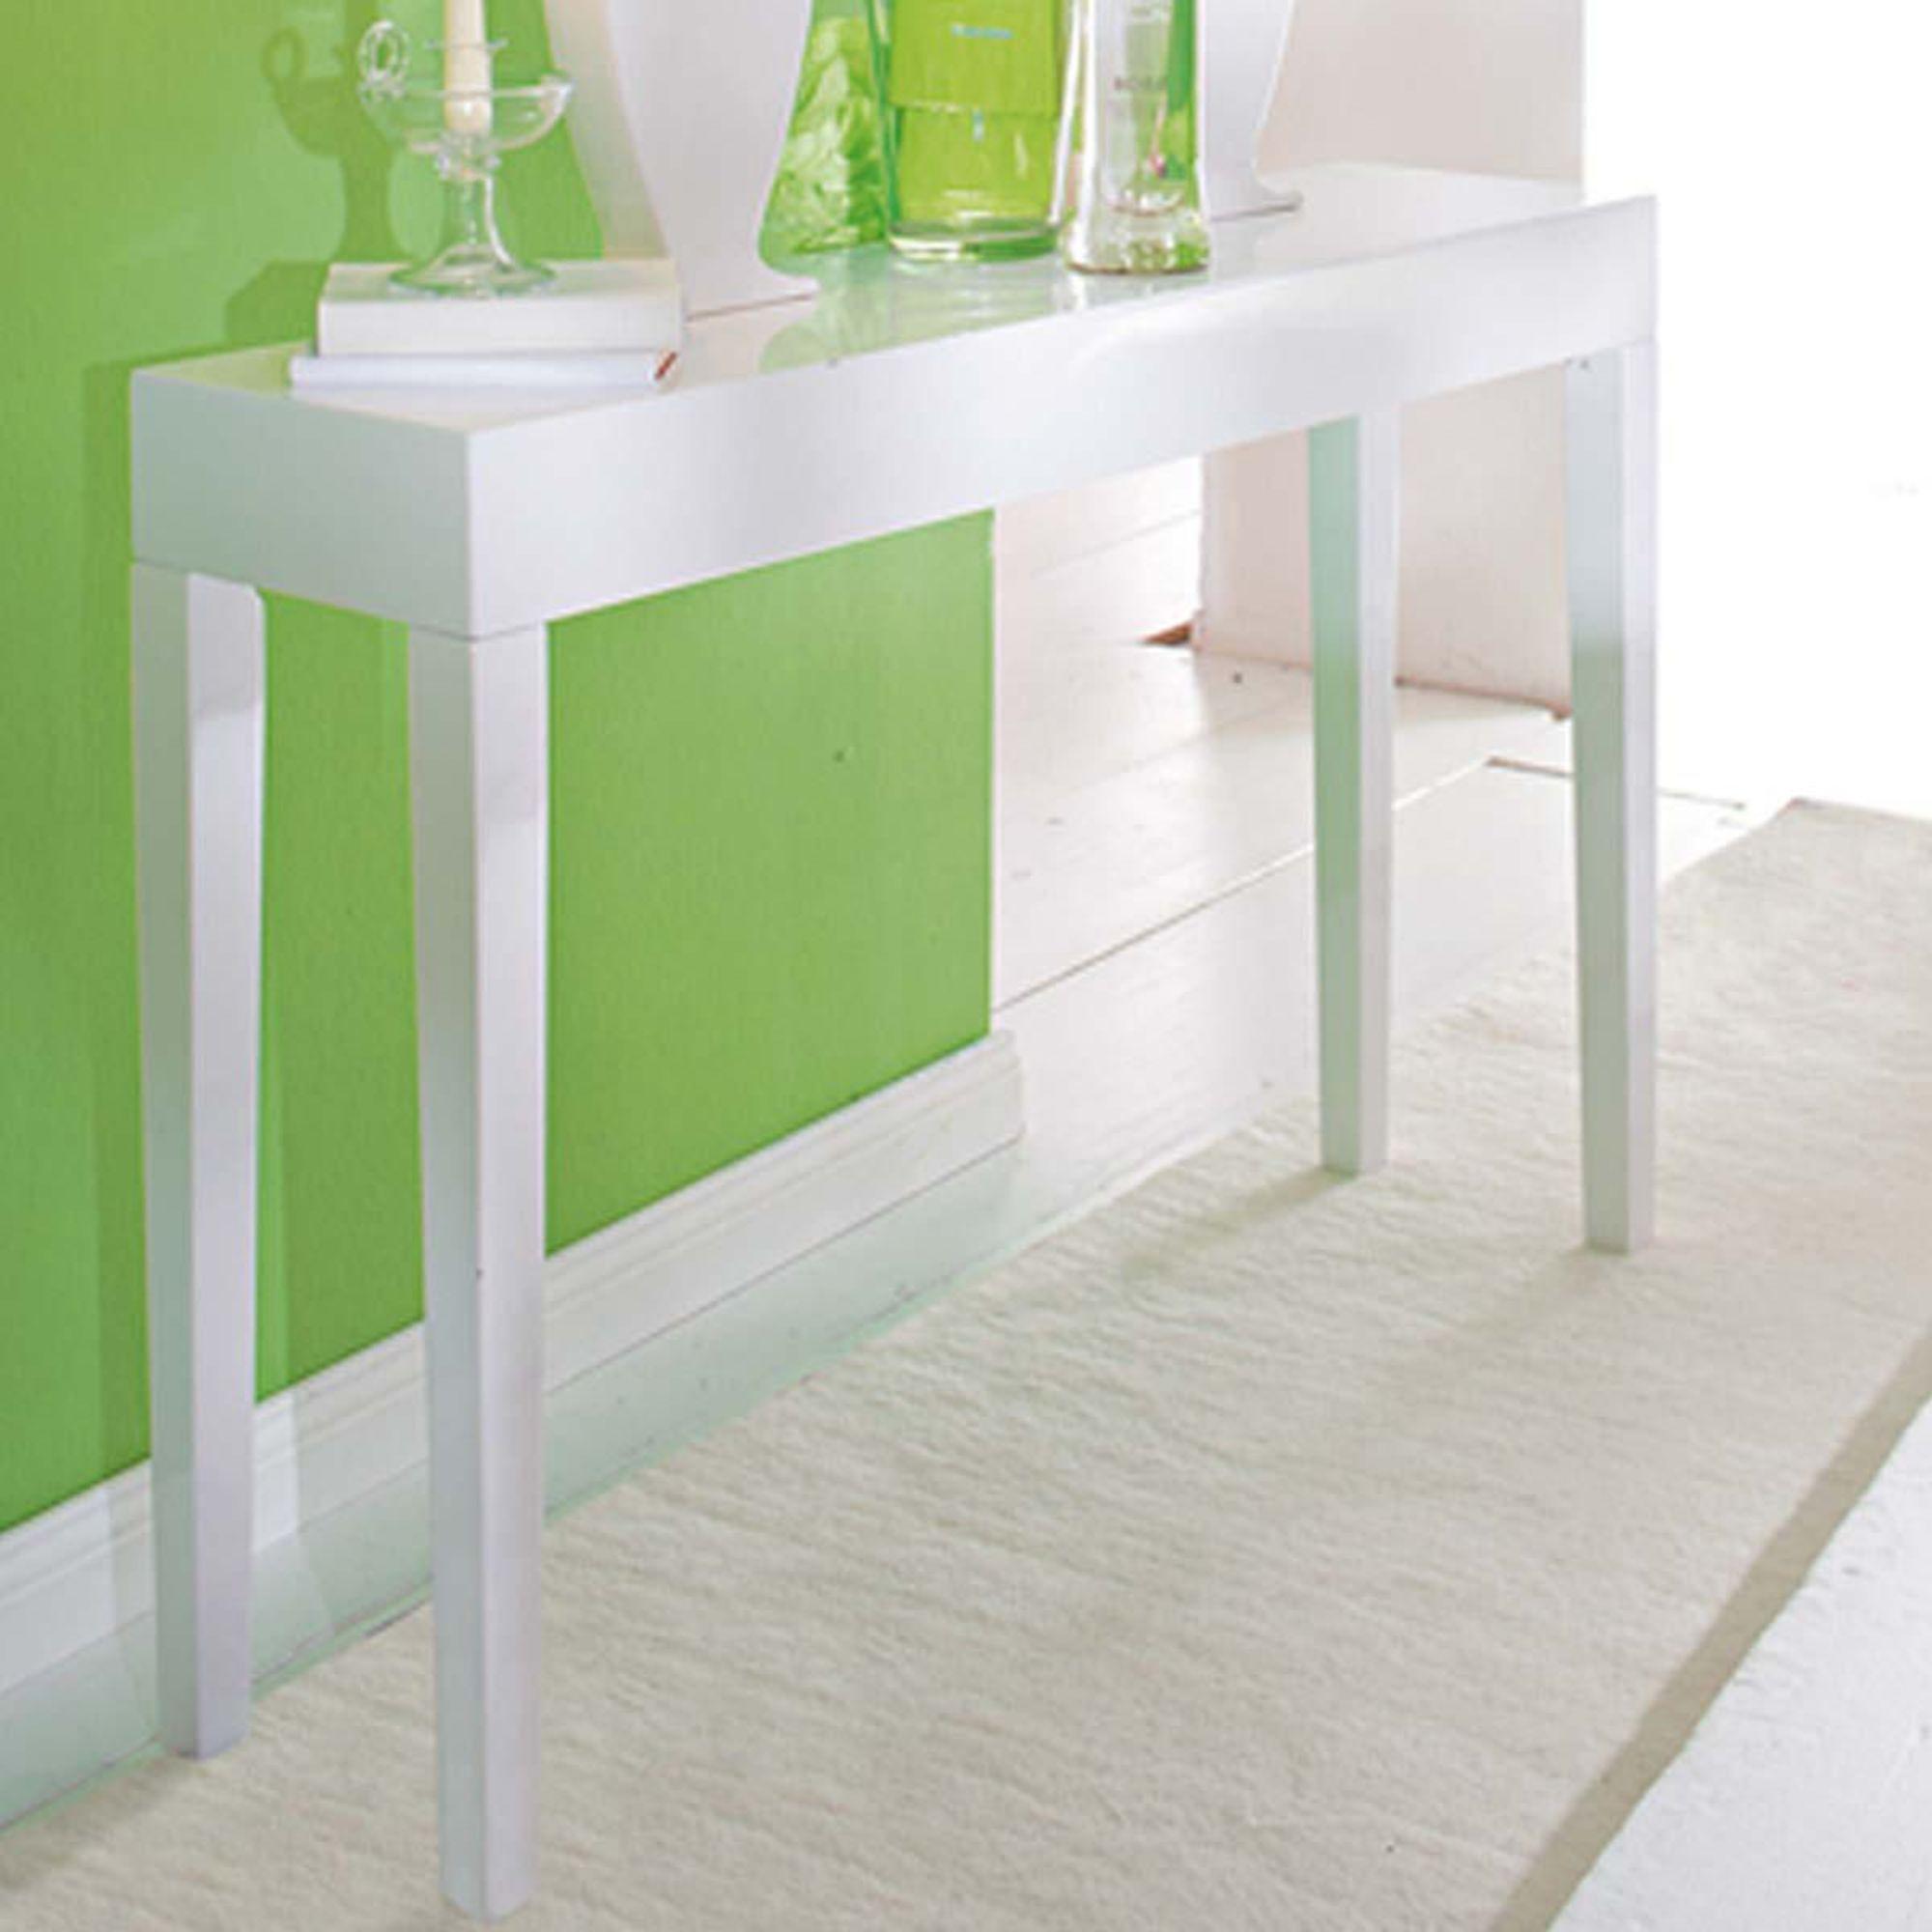 konsole flur full size of den flur einrichten flamingo. Black Bedroom Furniture Sets. Home Design Ideas